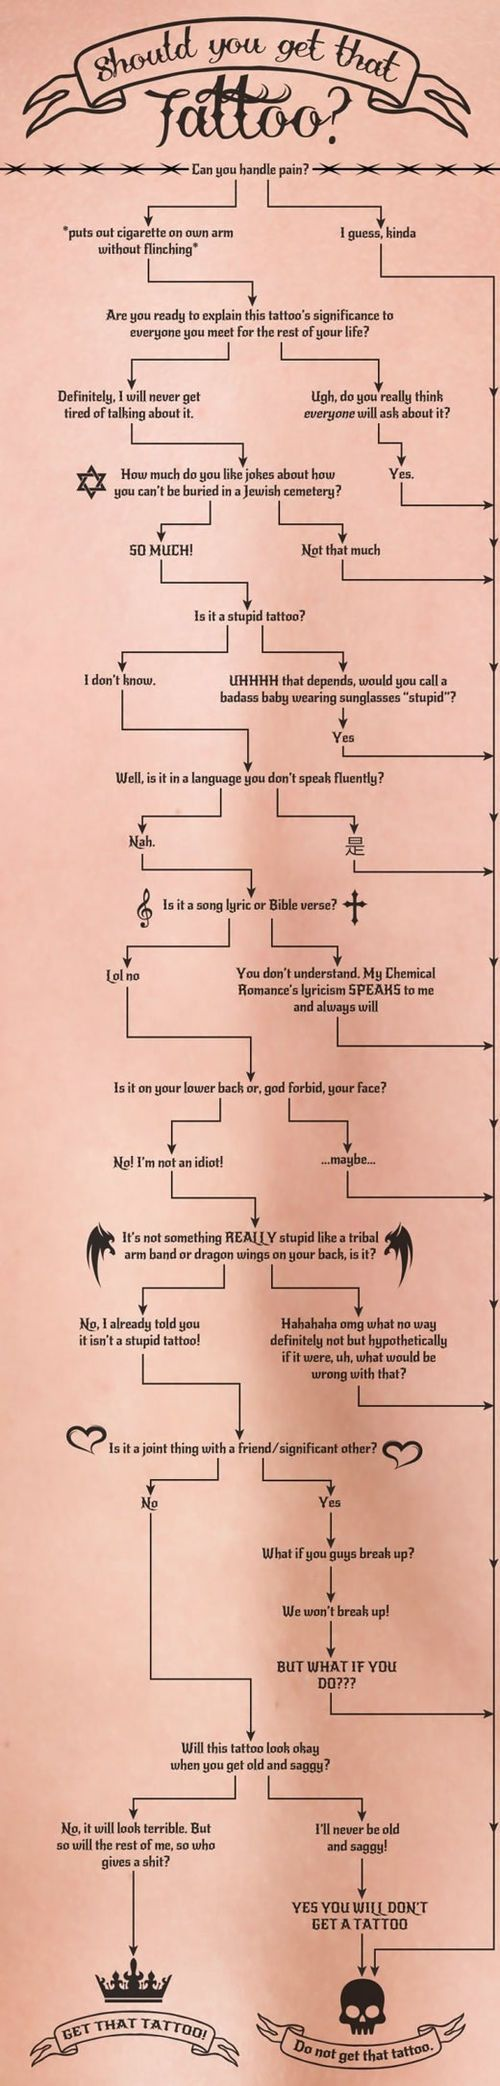 Bahahahahahaha!!!! This is too hilarious! Seriously people, no lower back tattoos and no song lyrics.